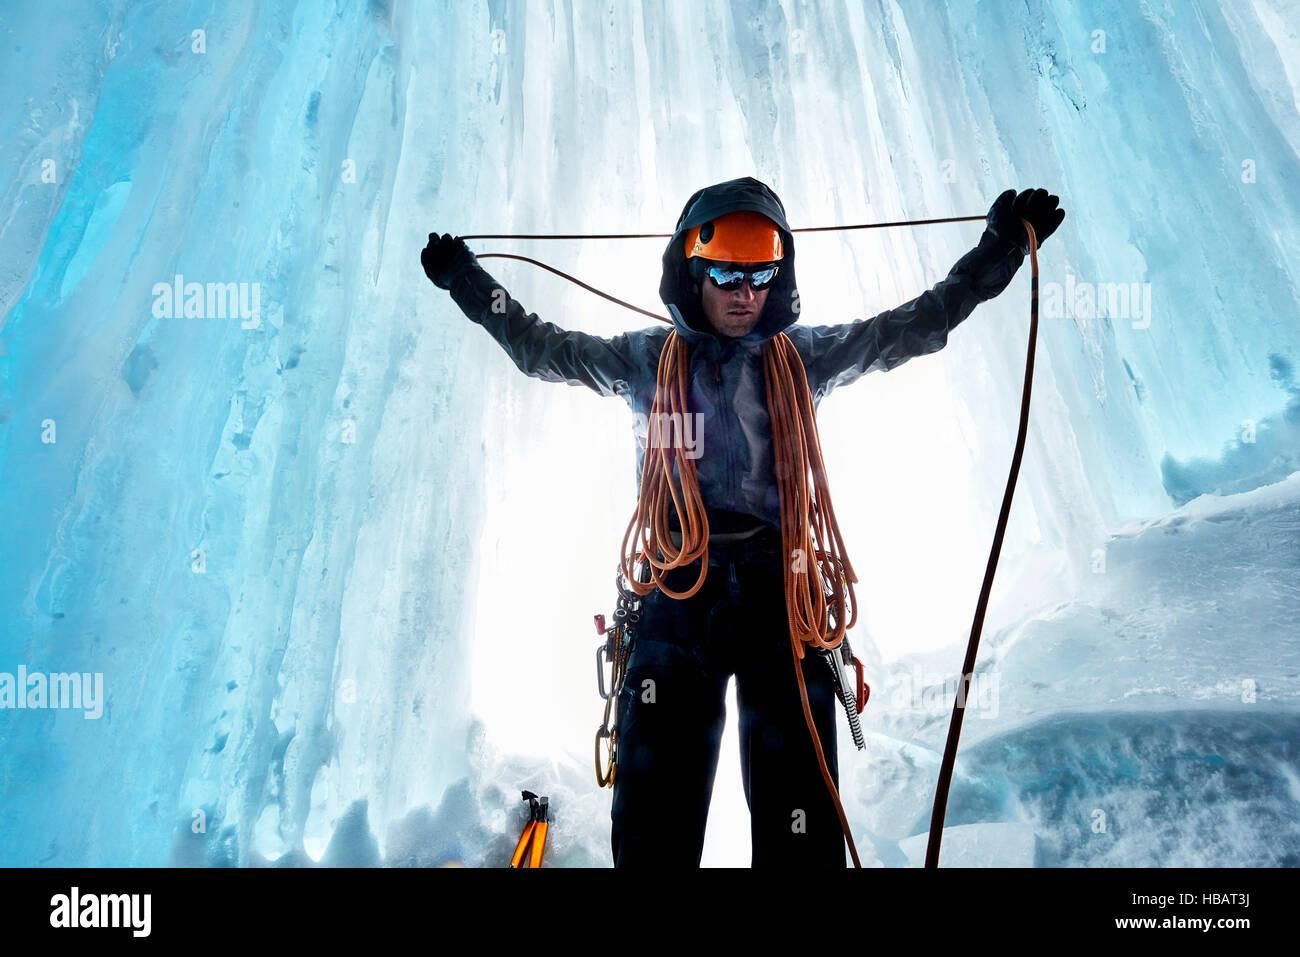 Man in ice cave preparing climbing rope, Saas Fee, Switzerland - Stock Image